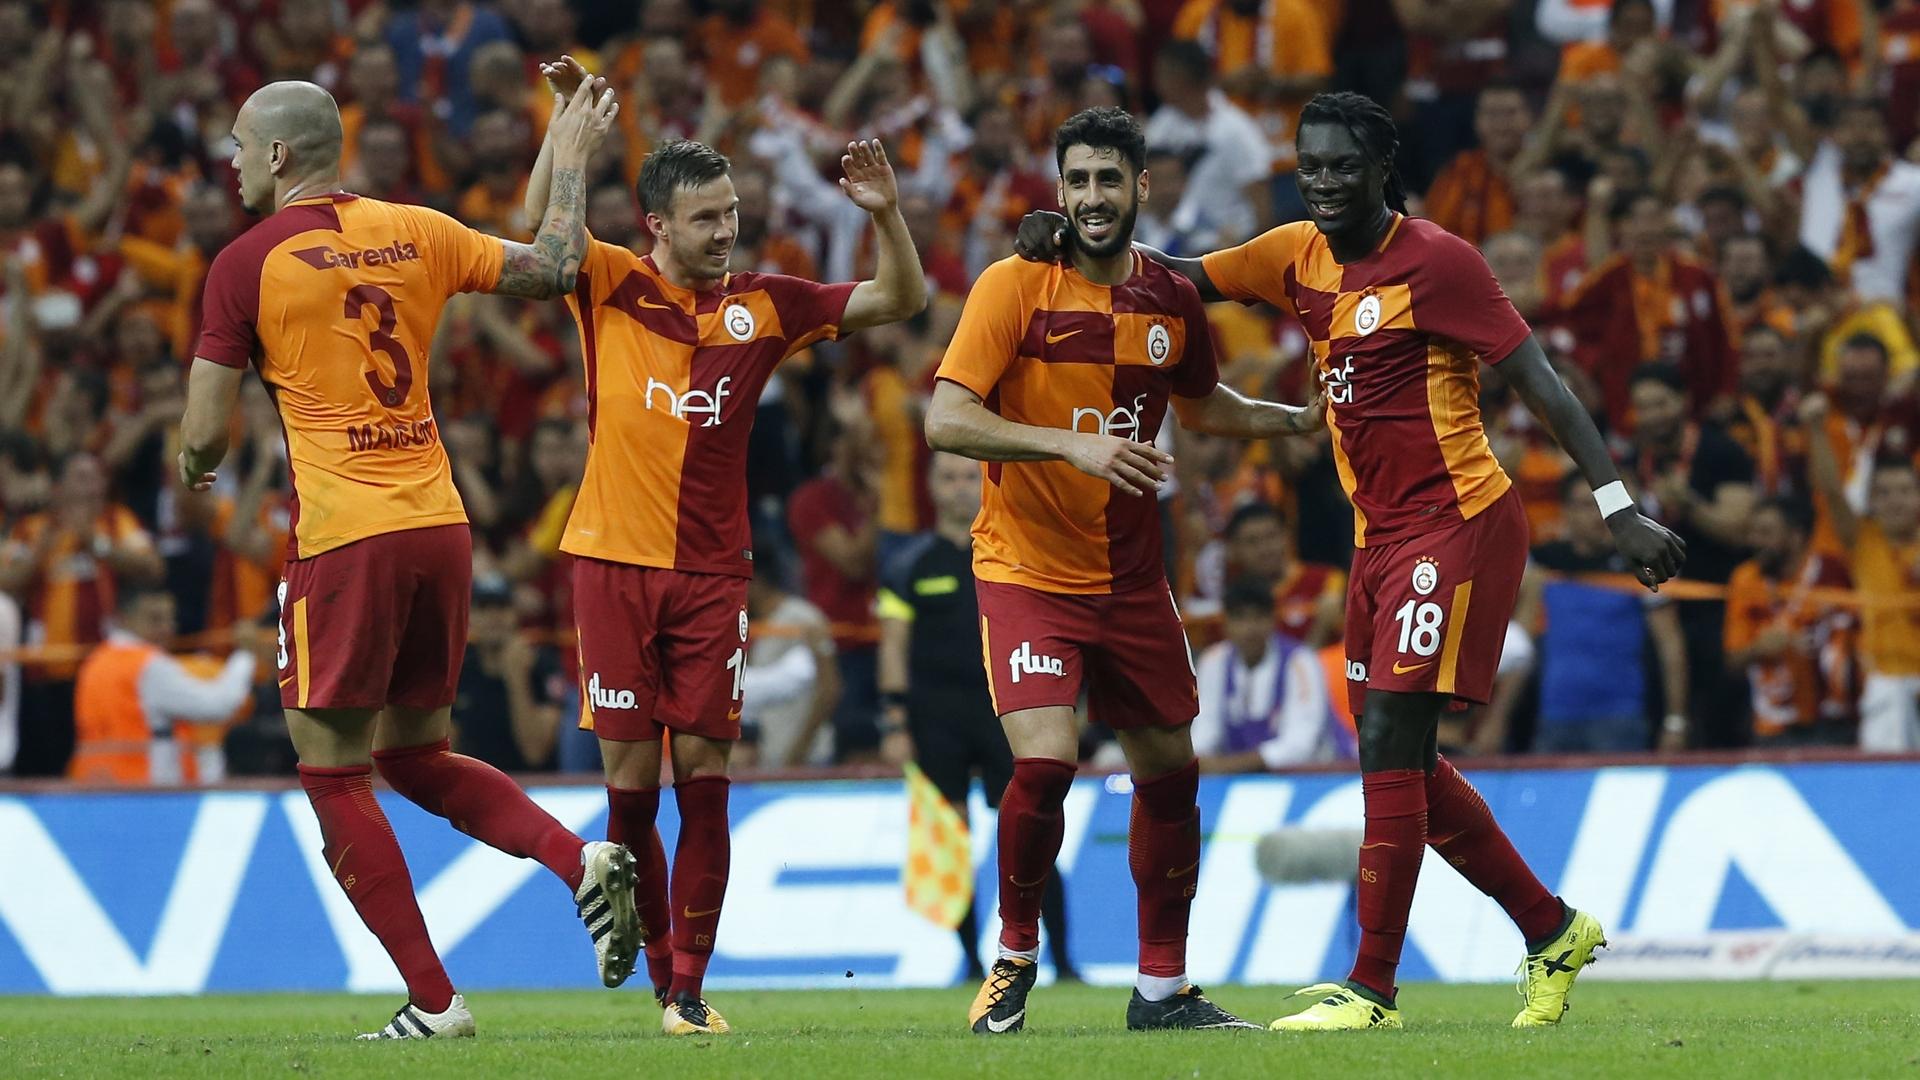 Maicon Linnes Tolga Cigerci Bafetimbi Gomis Galatasaray